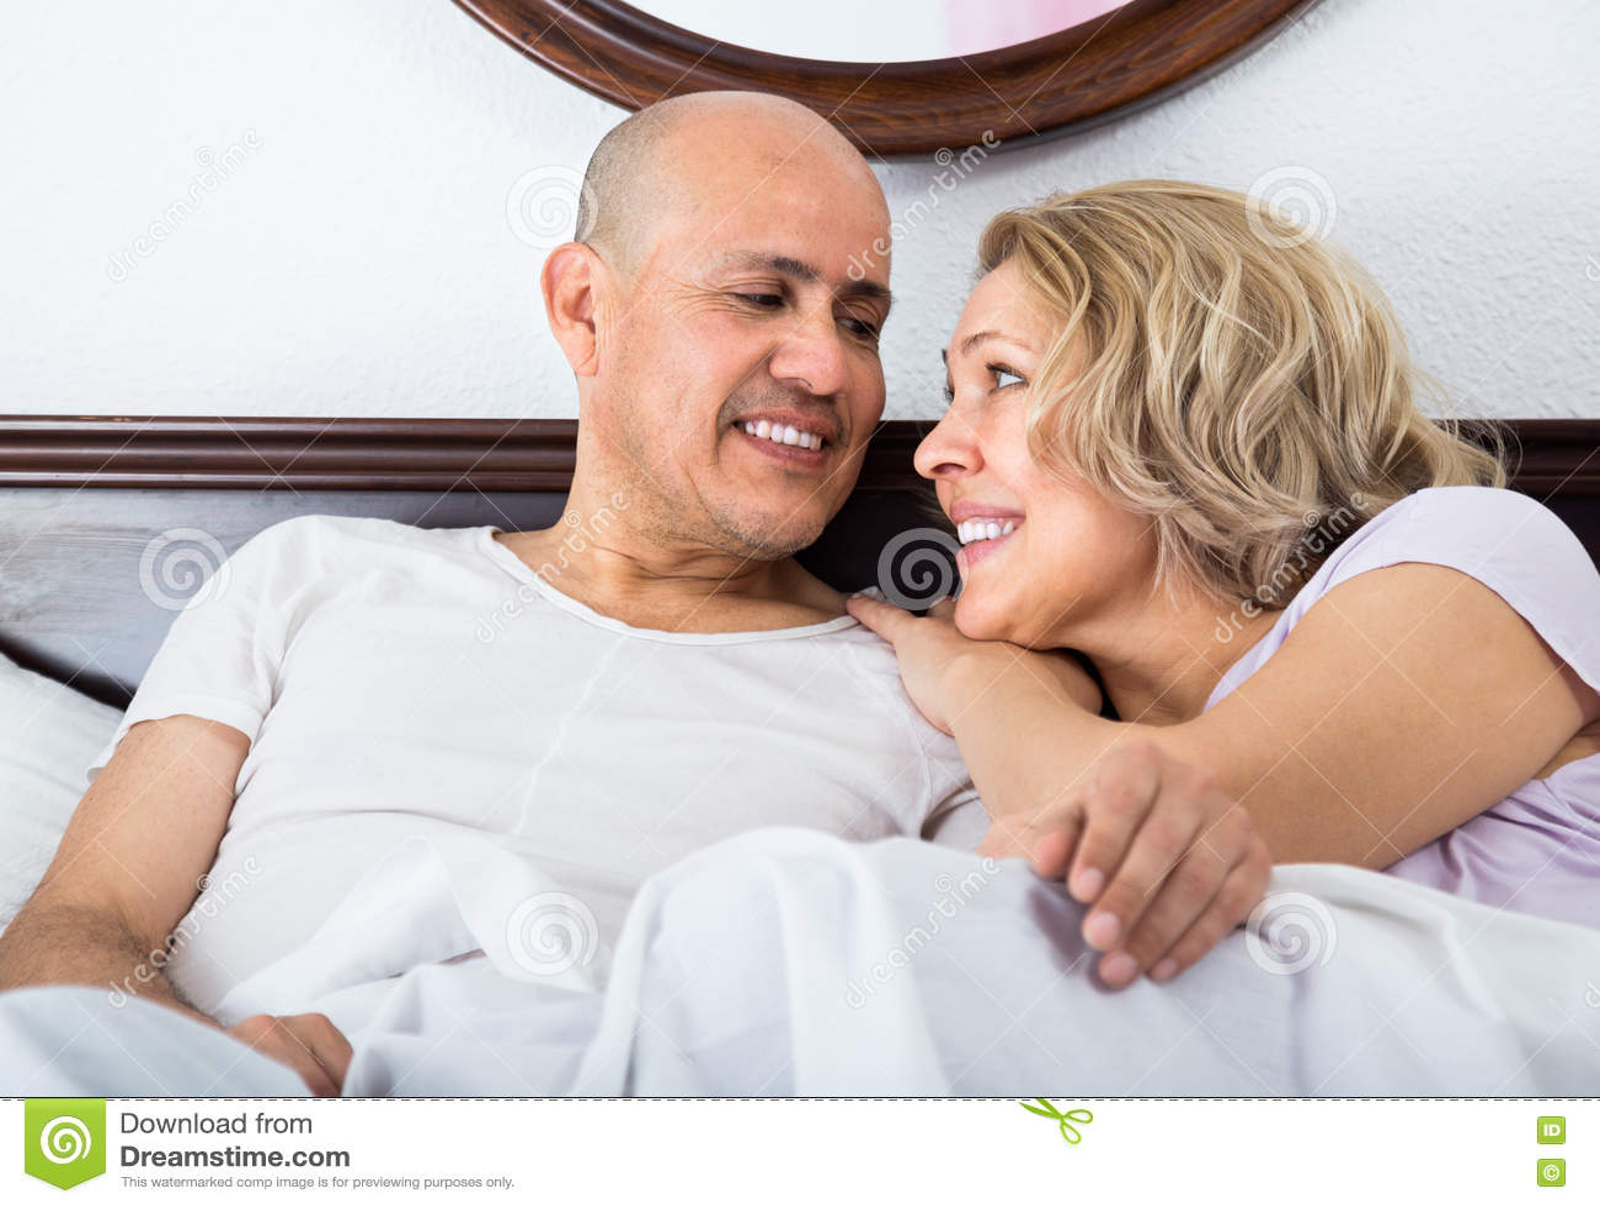 Dating een controle freak man